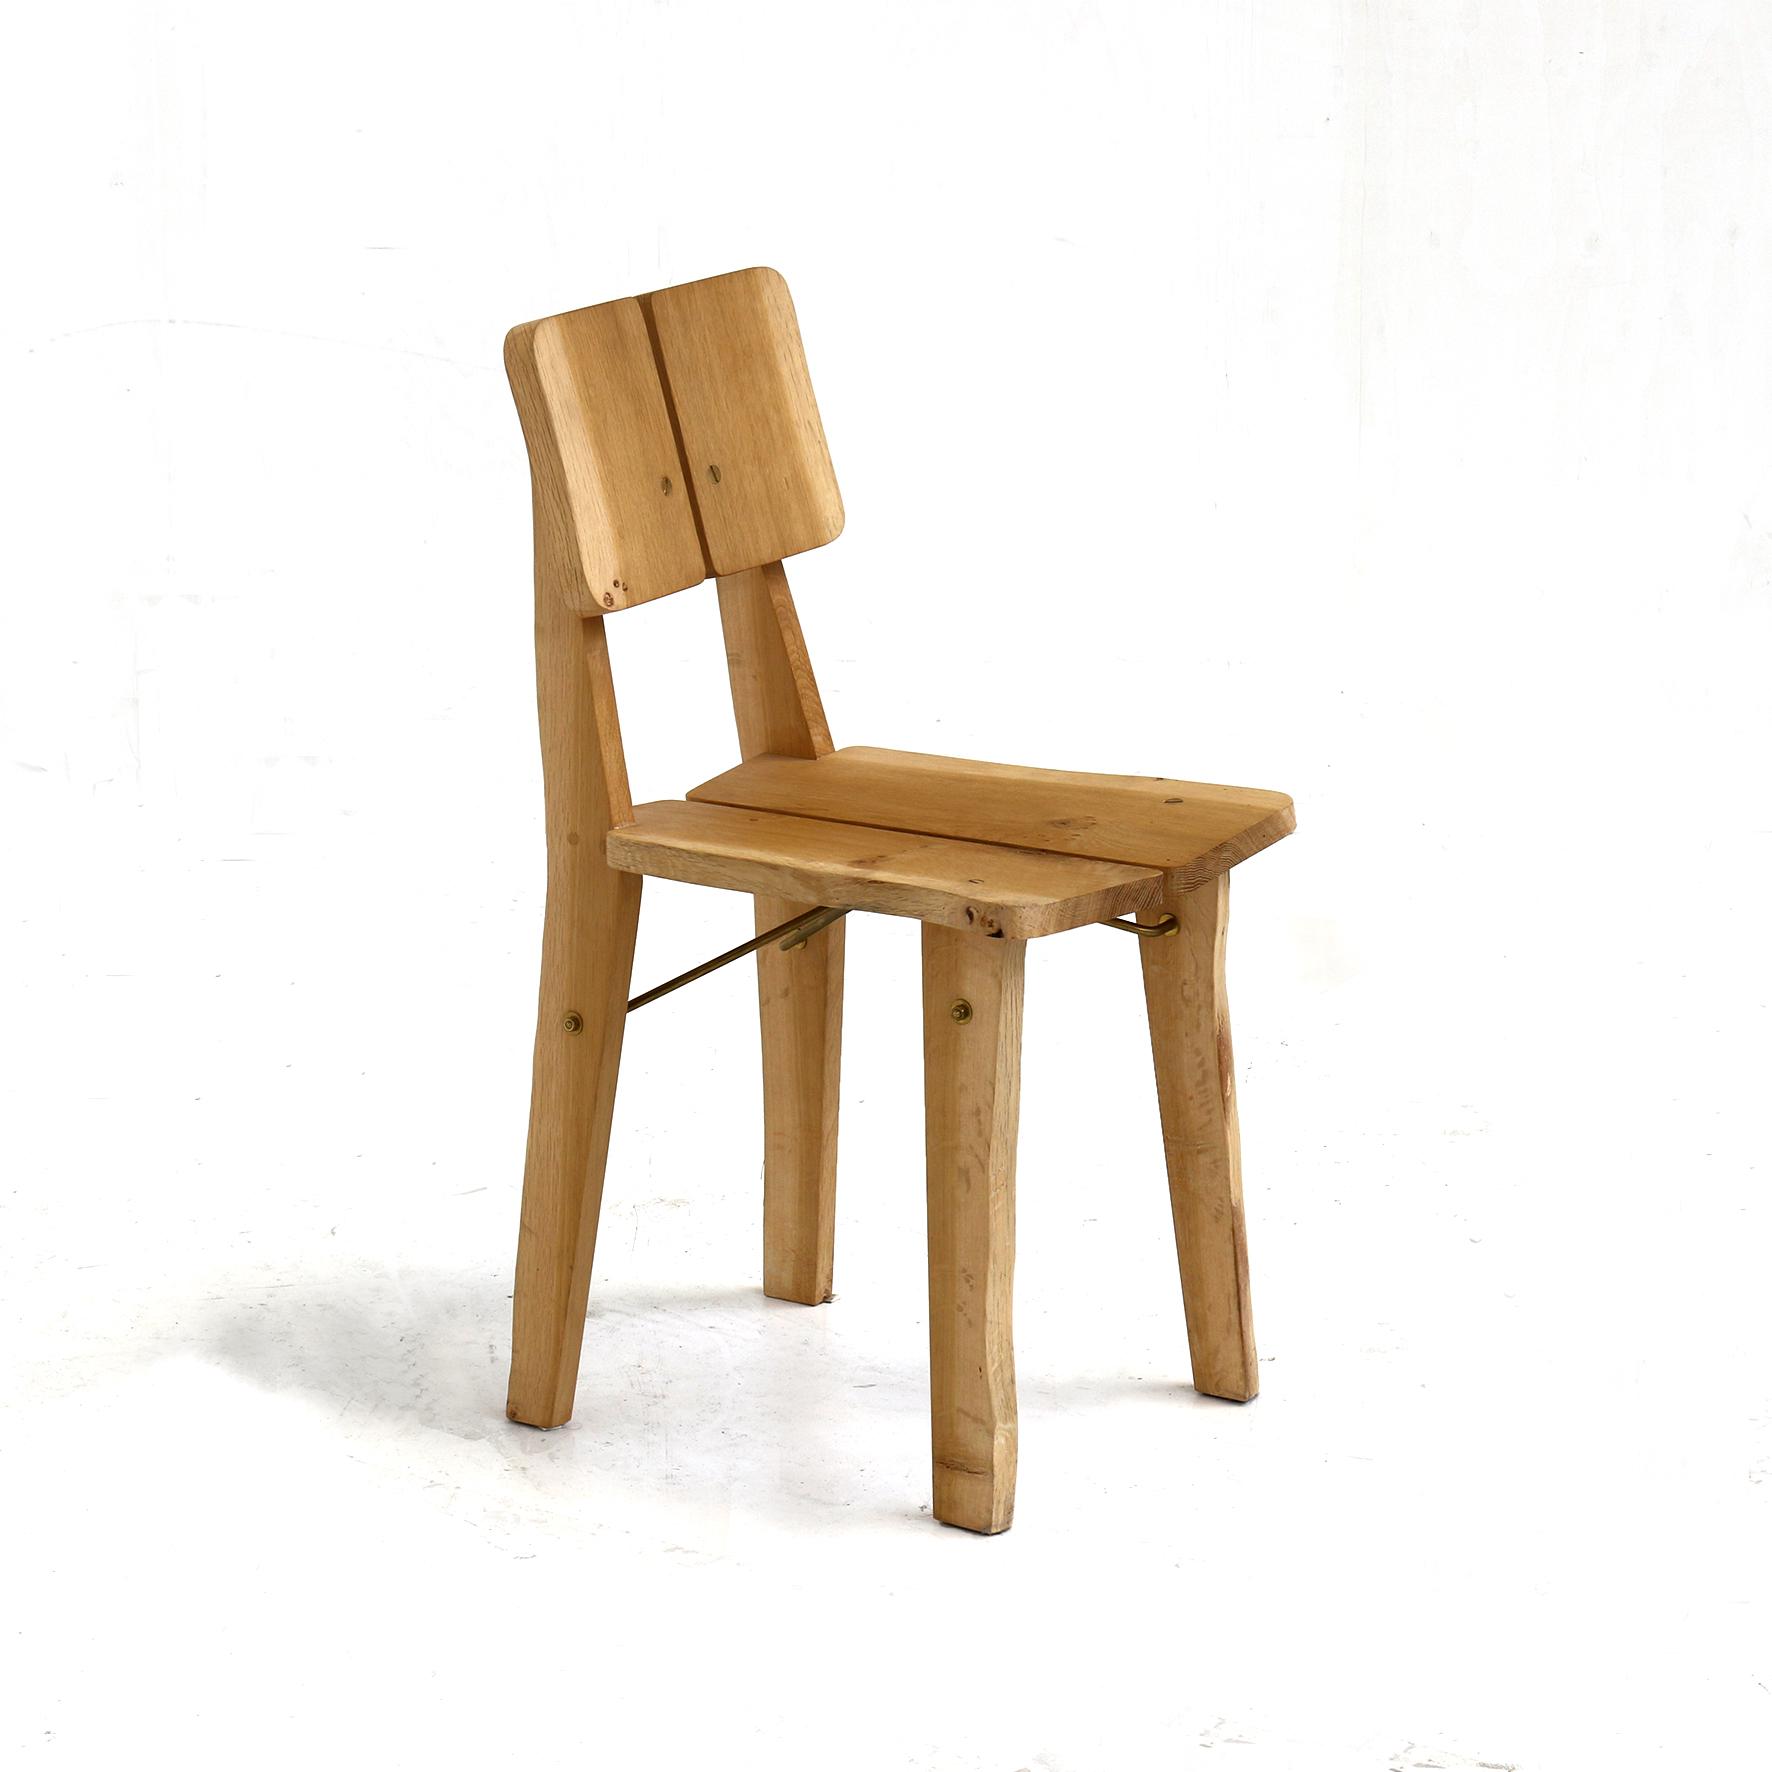 ieuwe-boomstamstoel-1 - new tree trunk chair